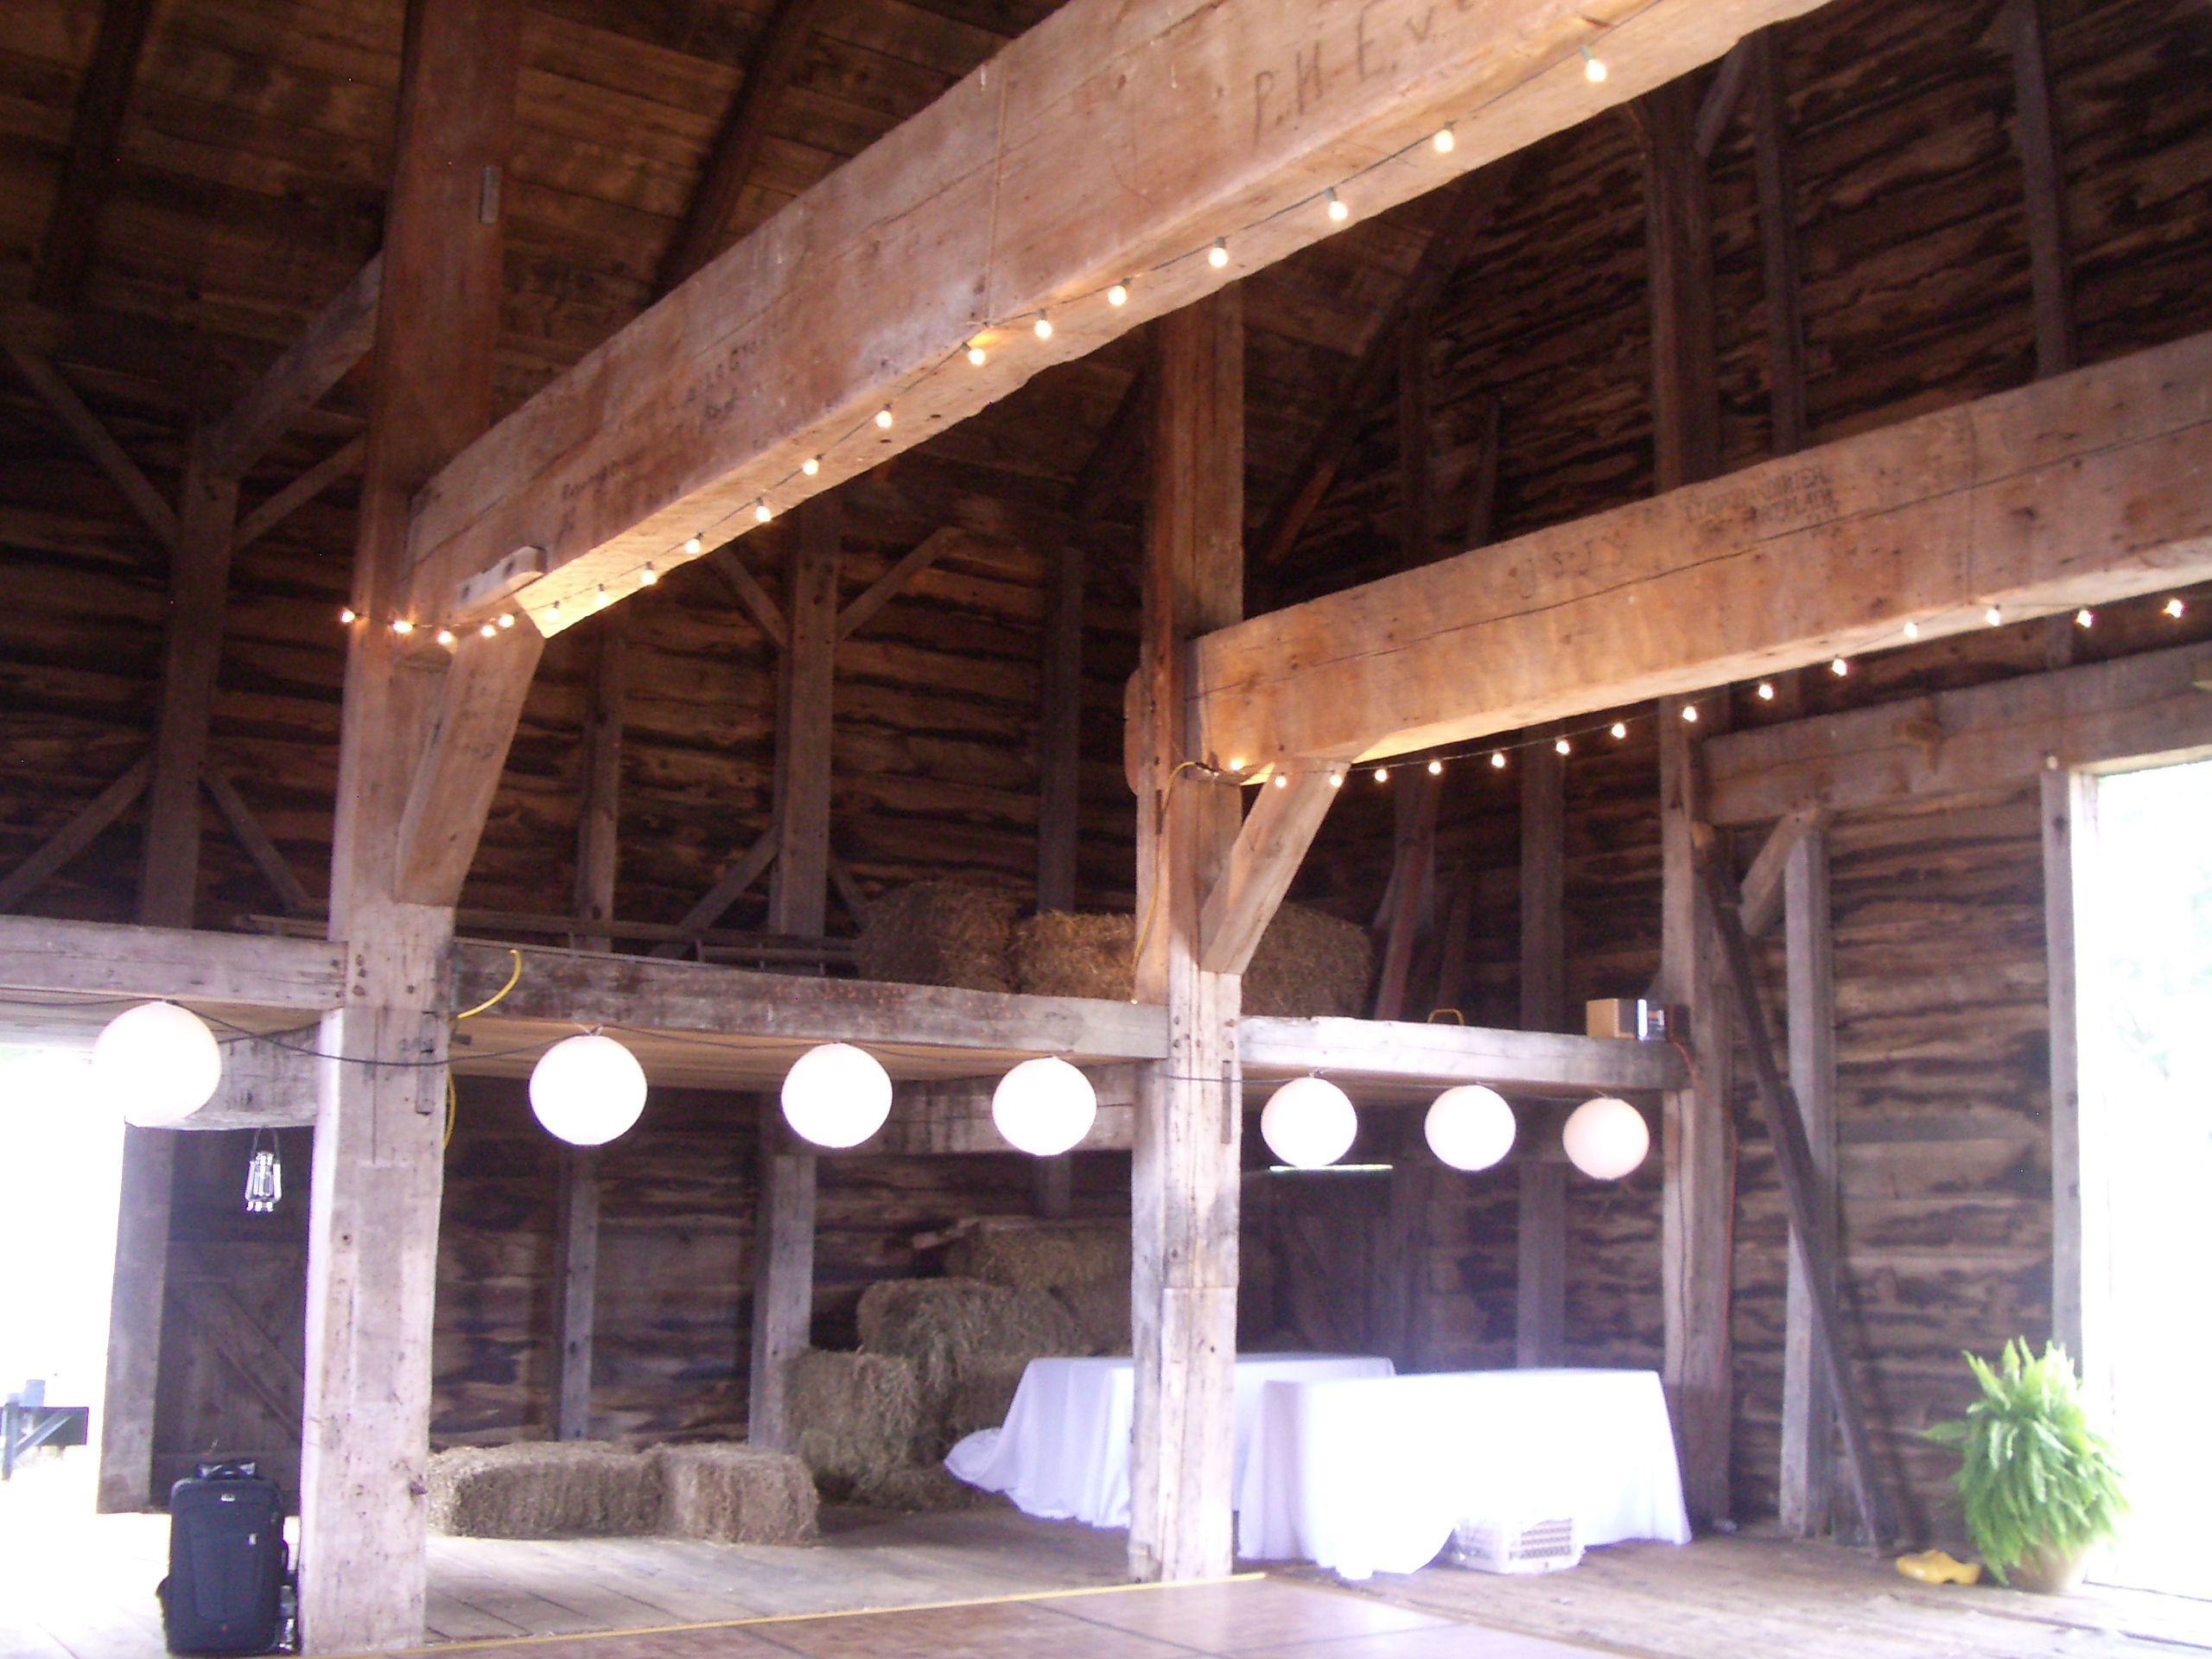 The barn - Circa 1799 Barn in NY state